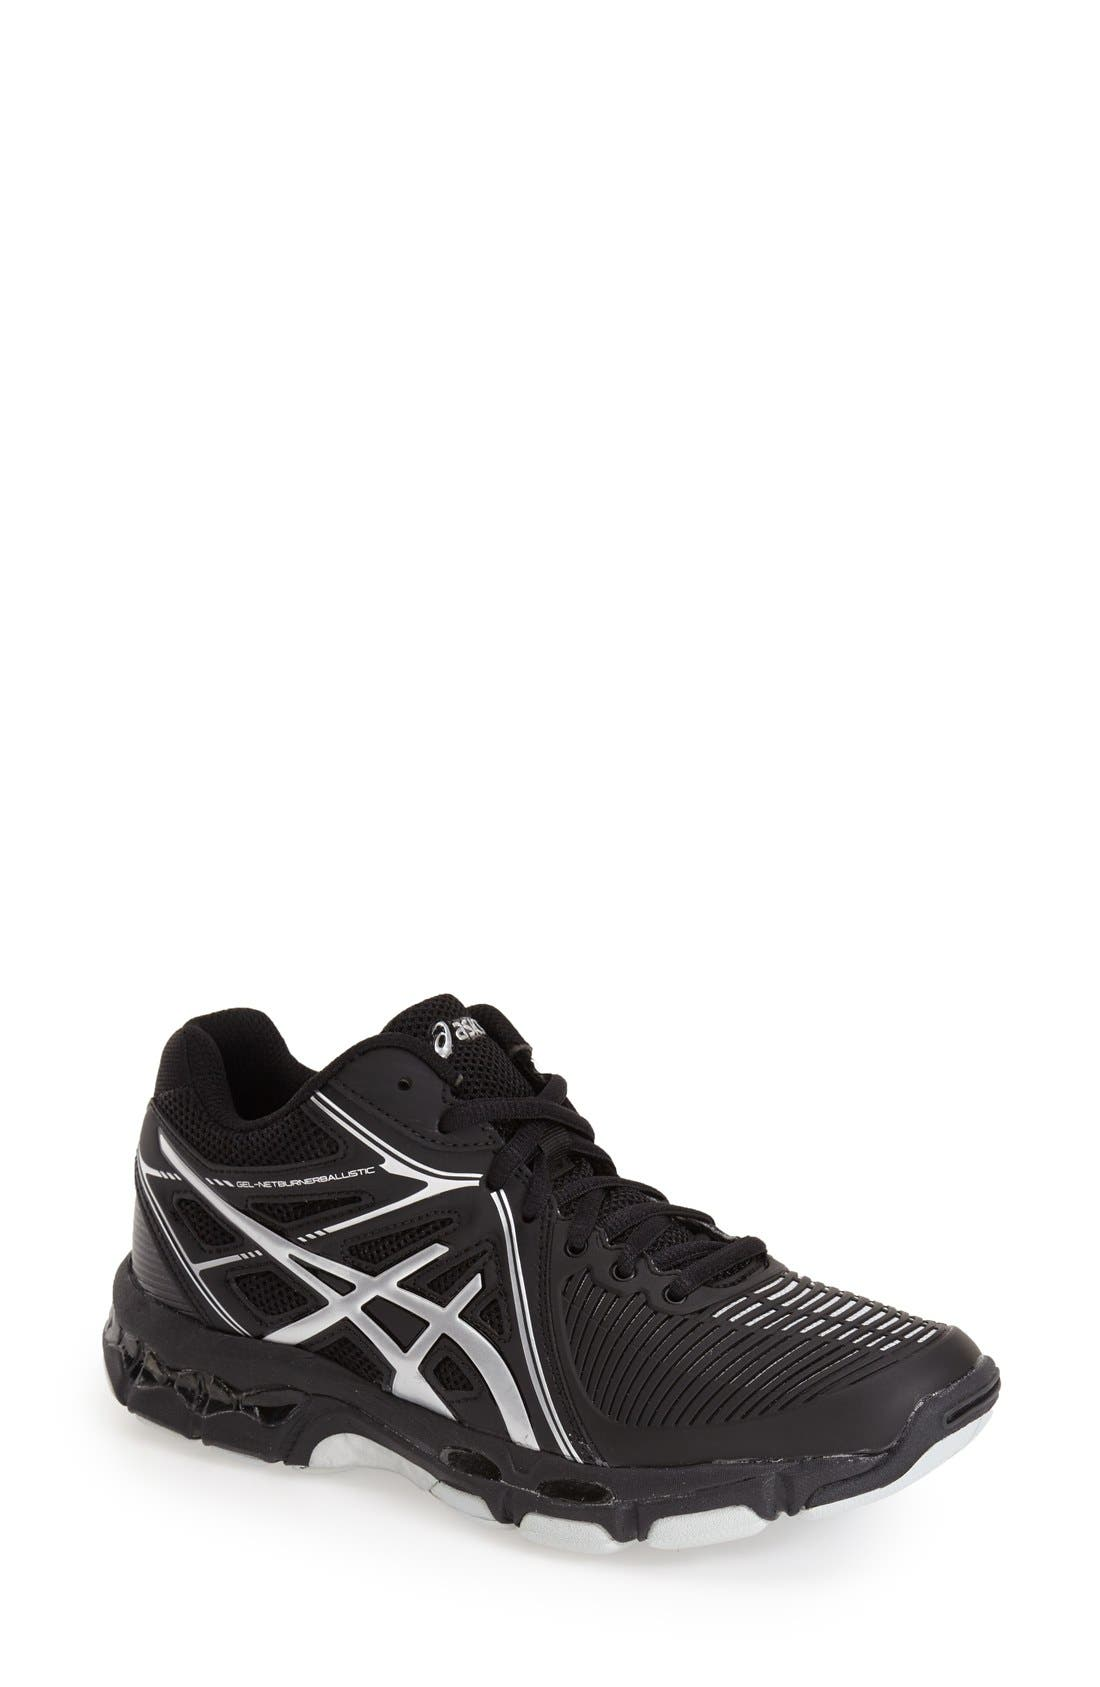 Main Image - ASICS® 'GEL-Netburner' Mid Volleyball Shoe (Women)